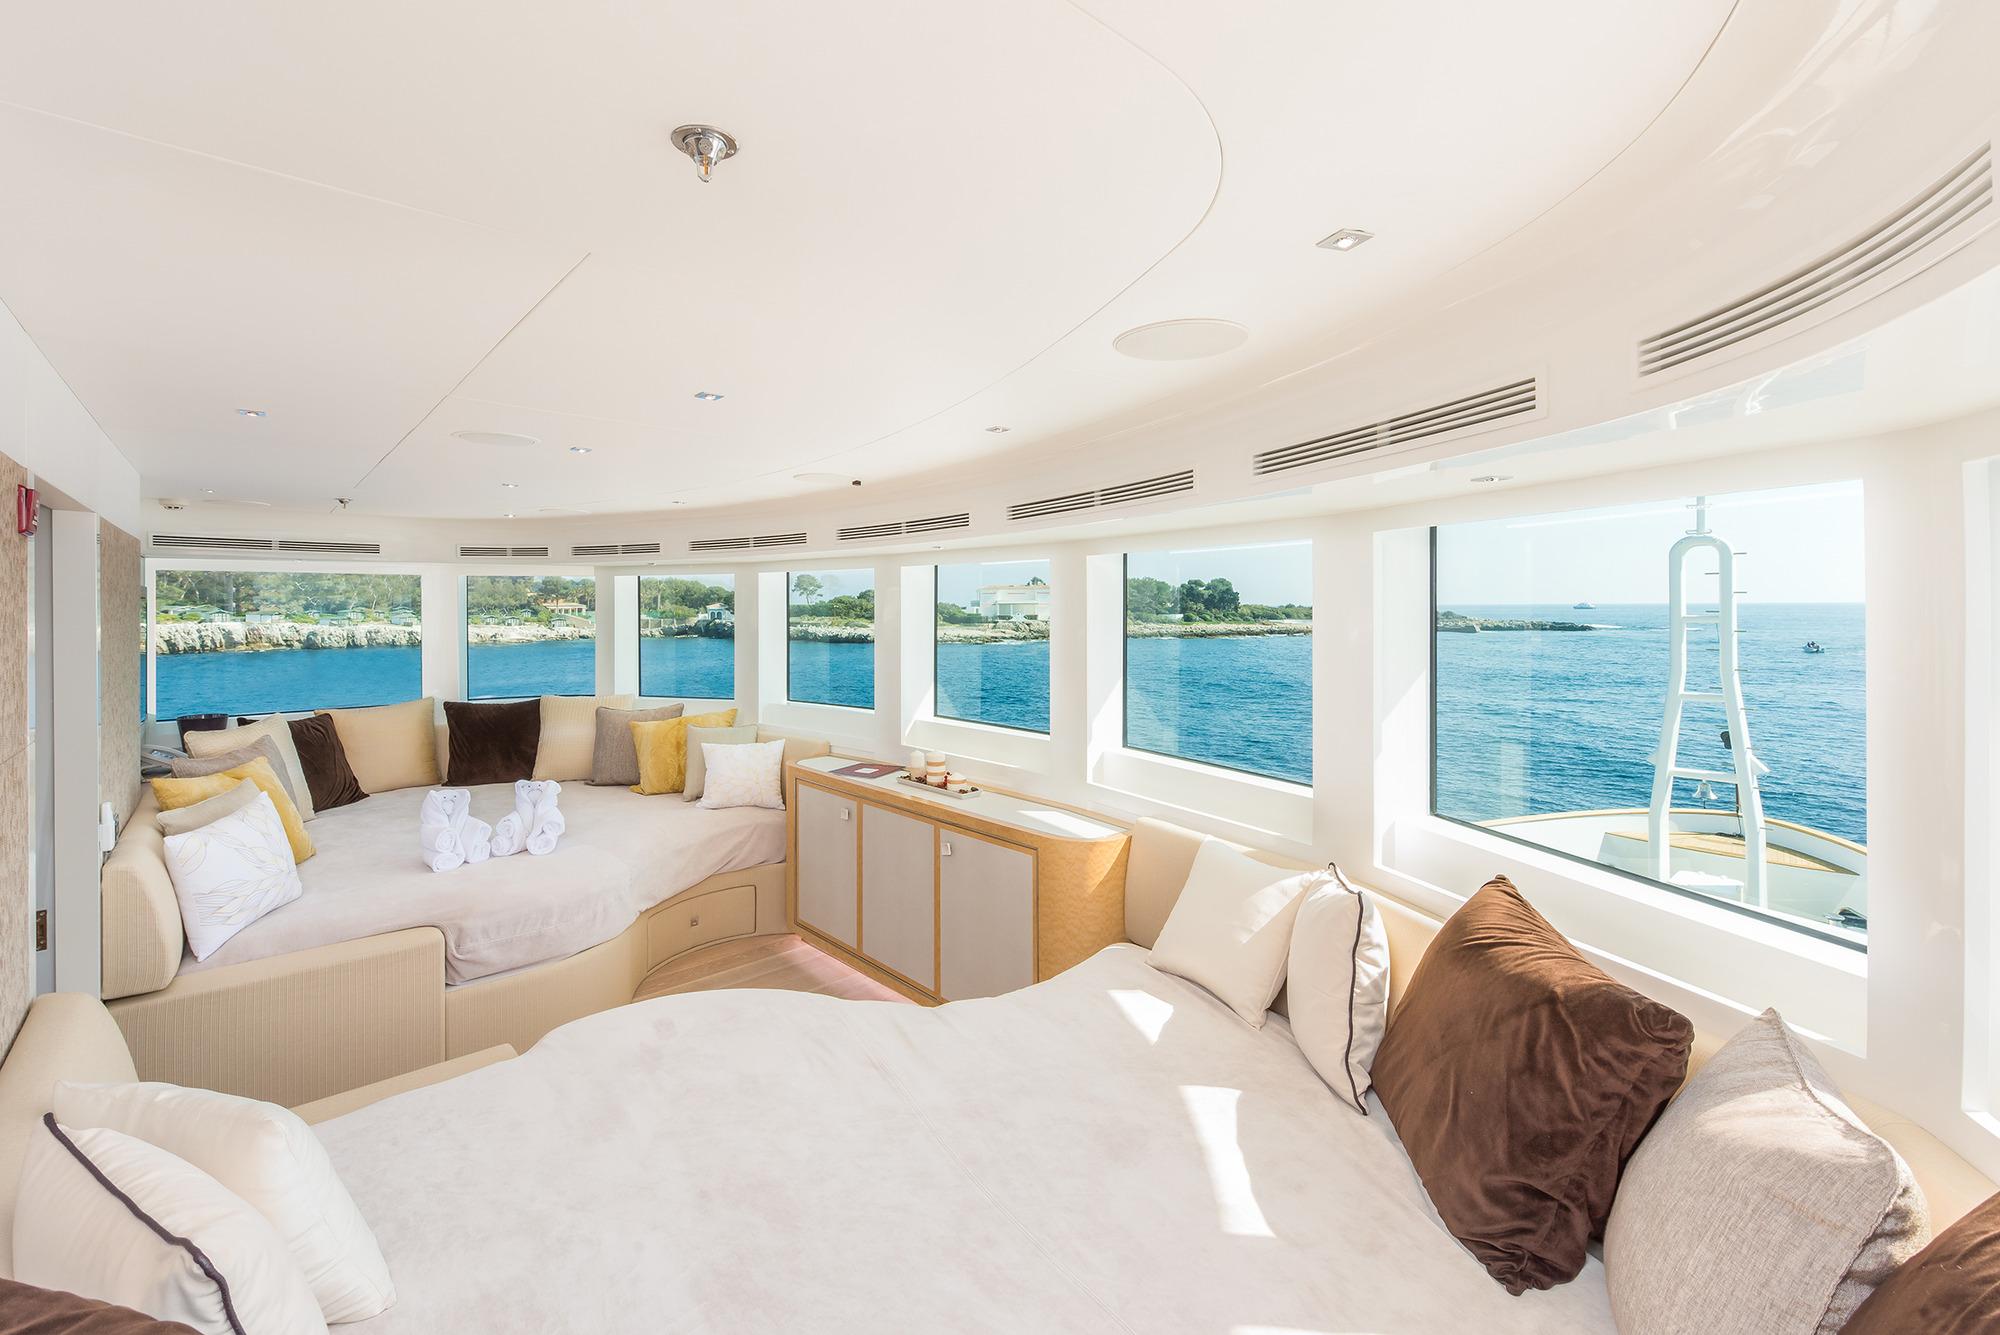 TV Room With Panoramic Views